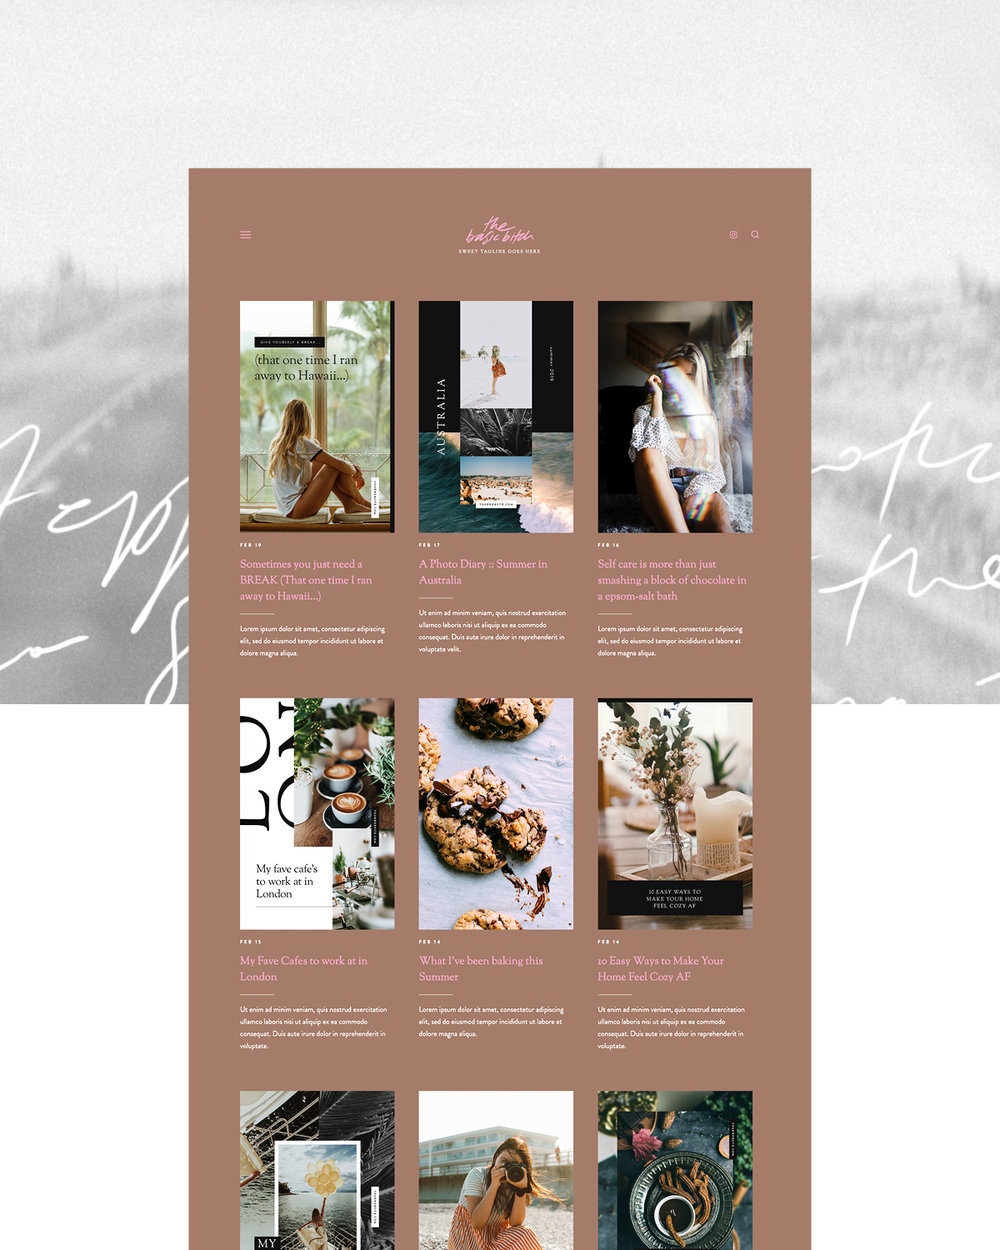 The Basic Bitch – Squarespace Design Kit |Good As Gold Studio | Squarespace Design Kit Templates & DIY Branding